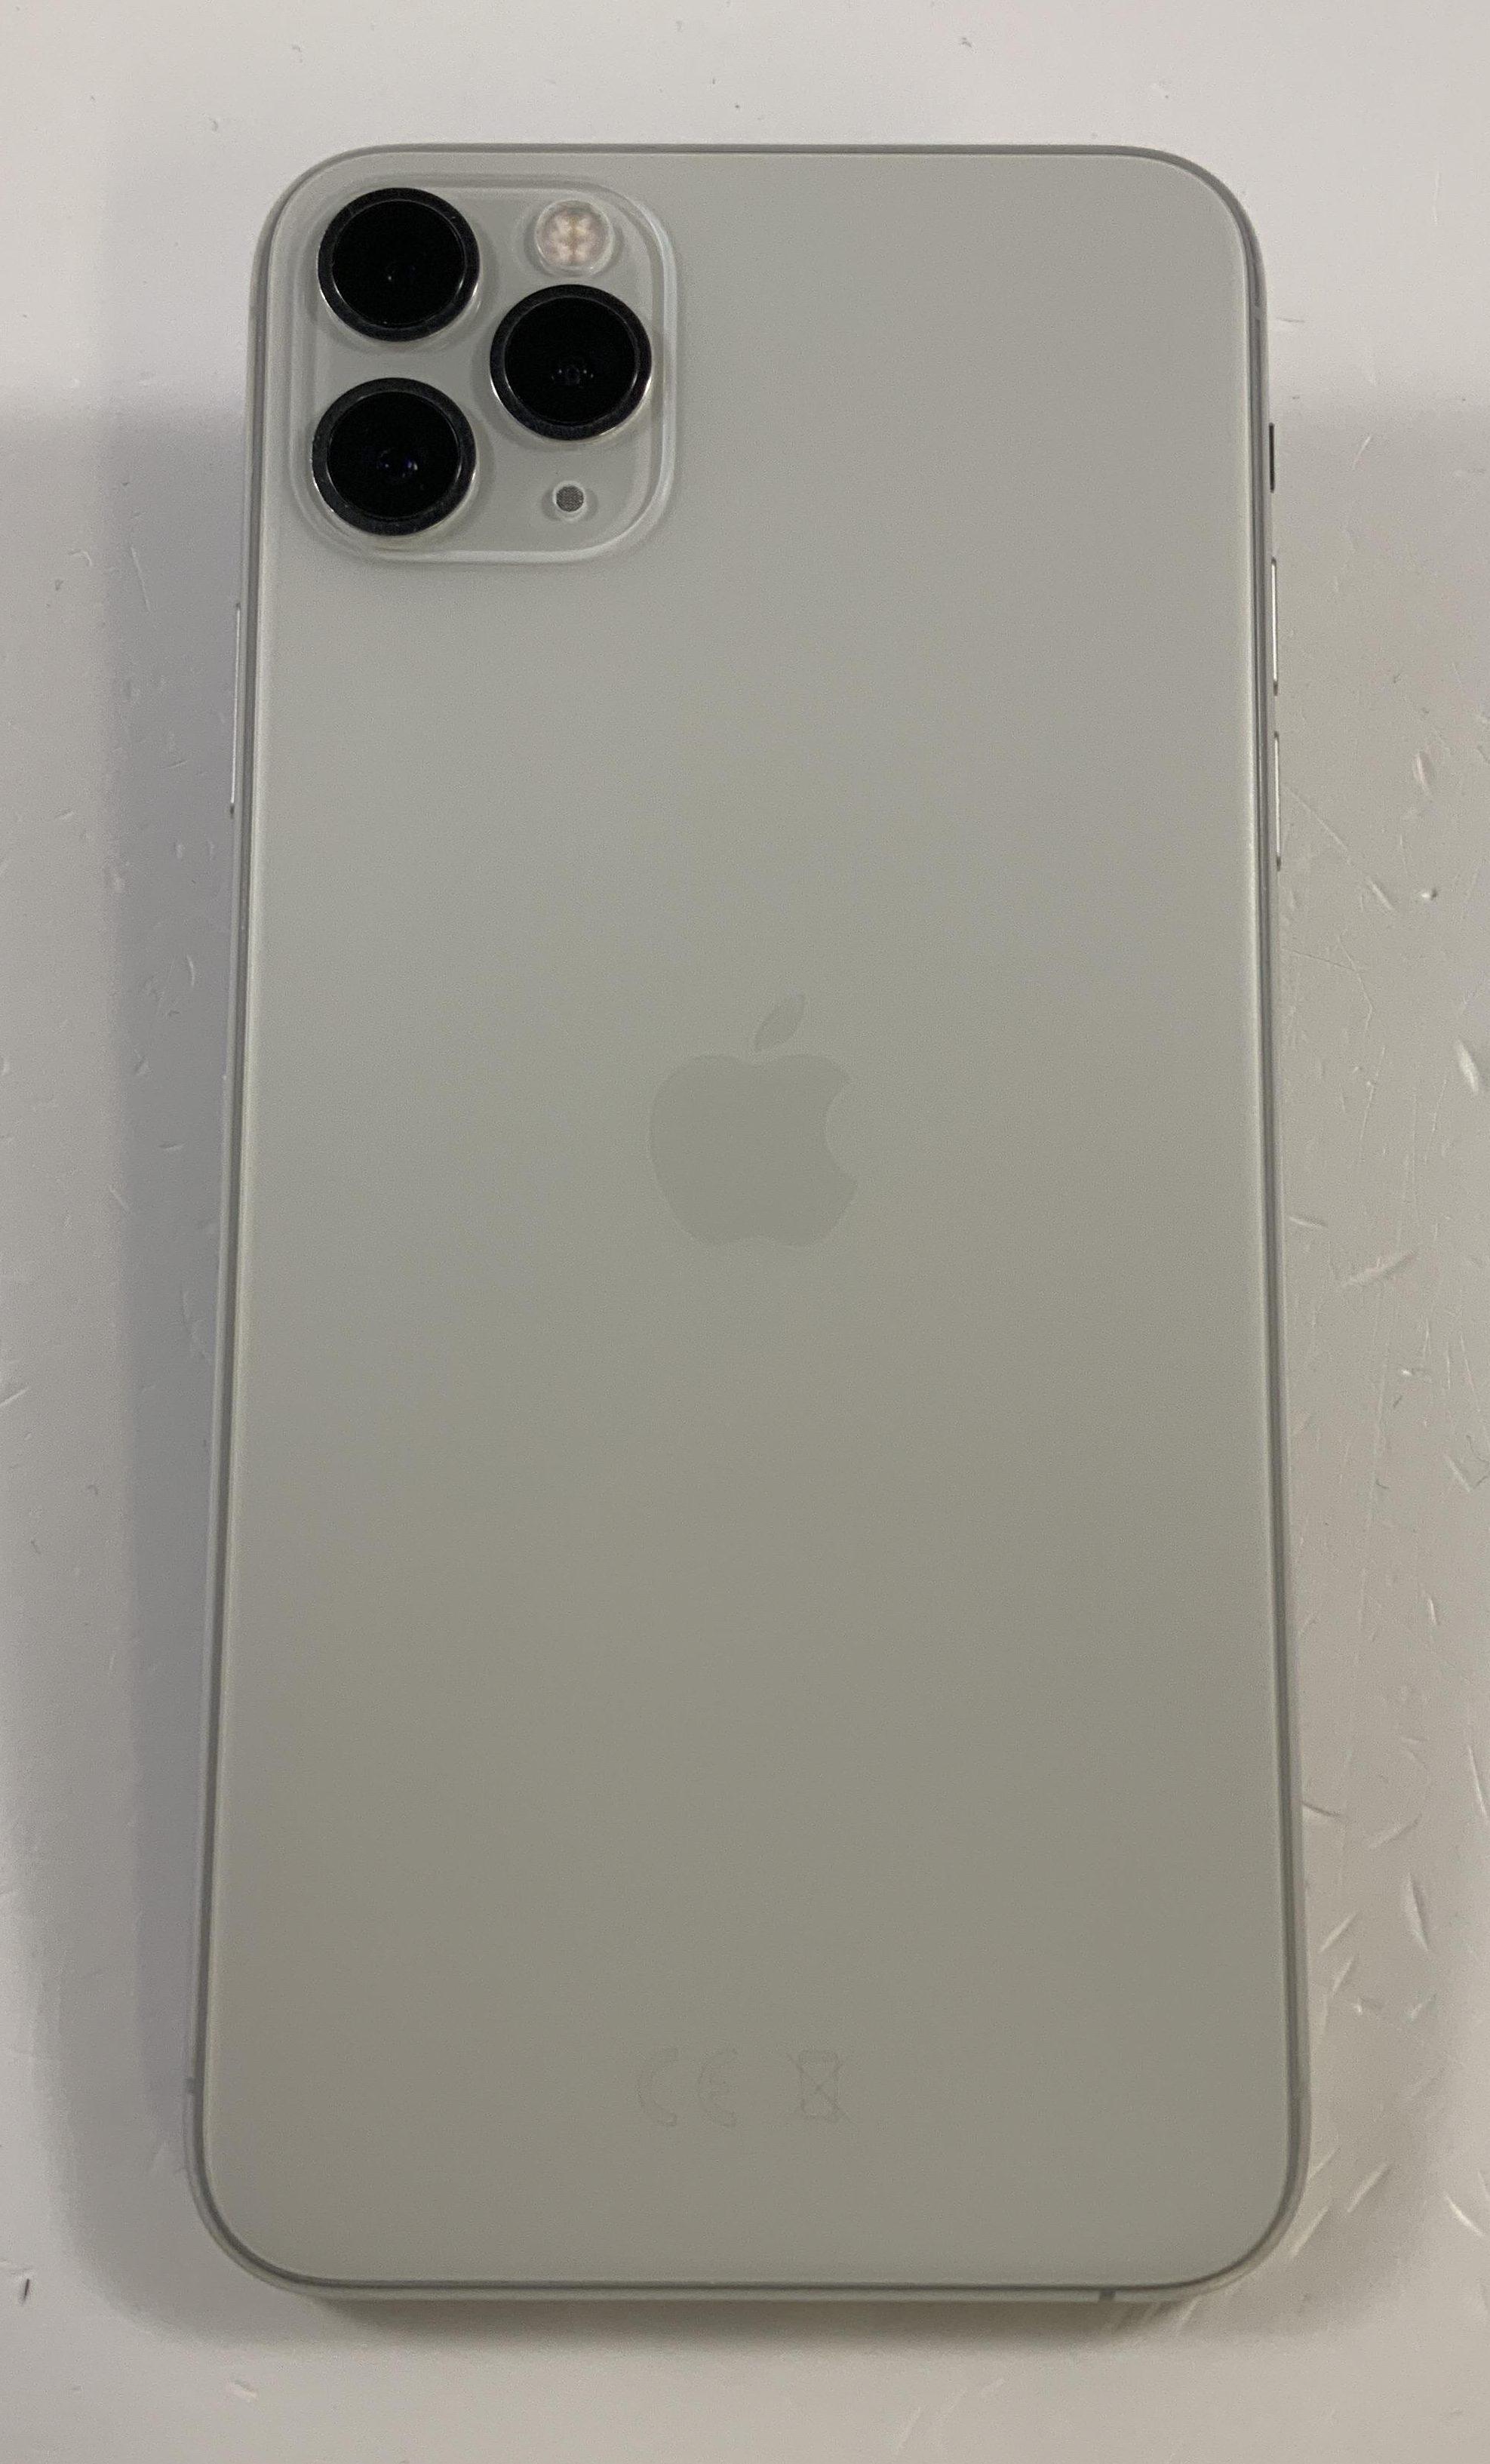 iPhone 11 Pro Max 64GB, 64GB, Silver, Afbeelding 2